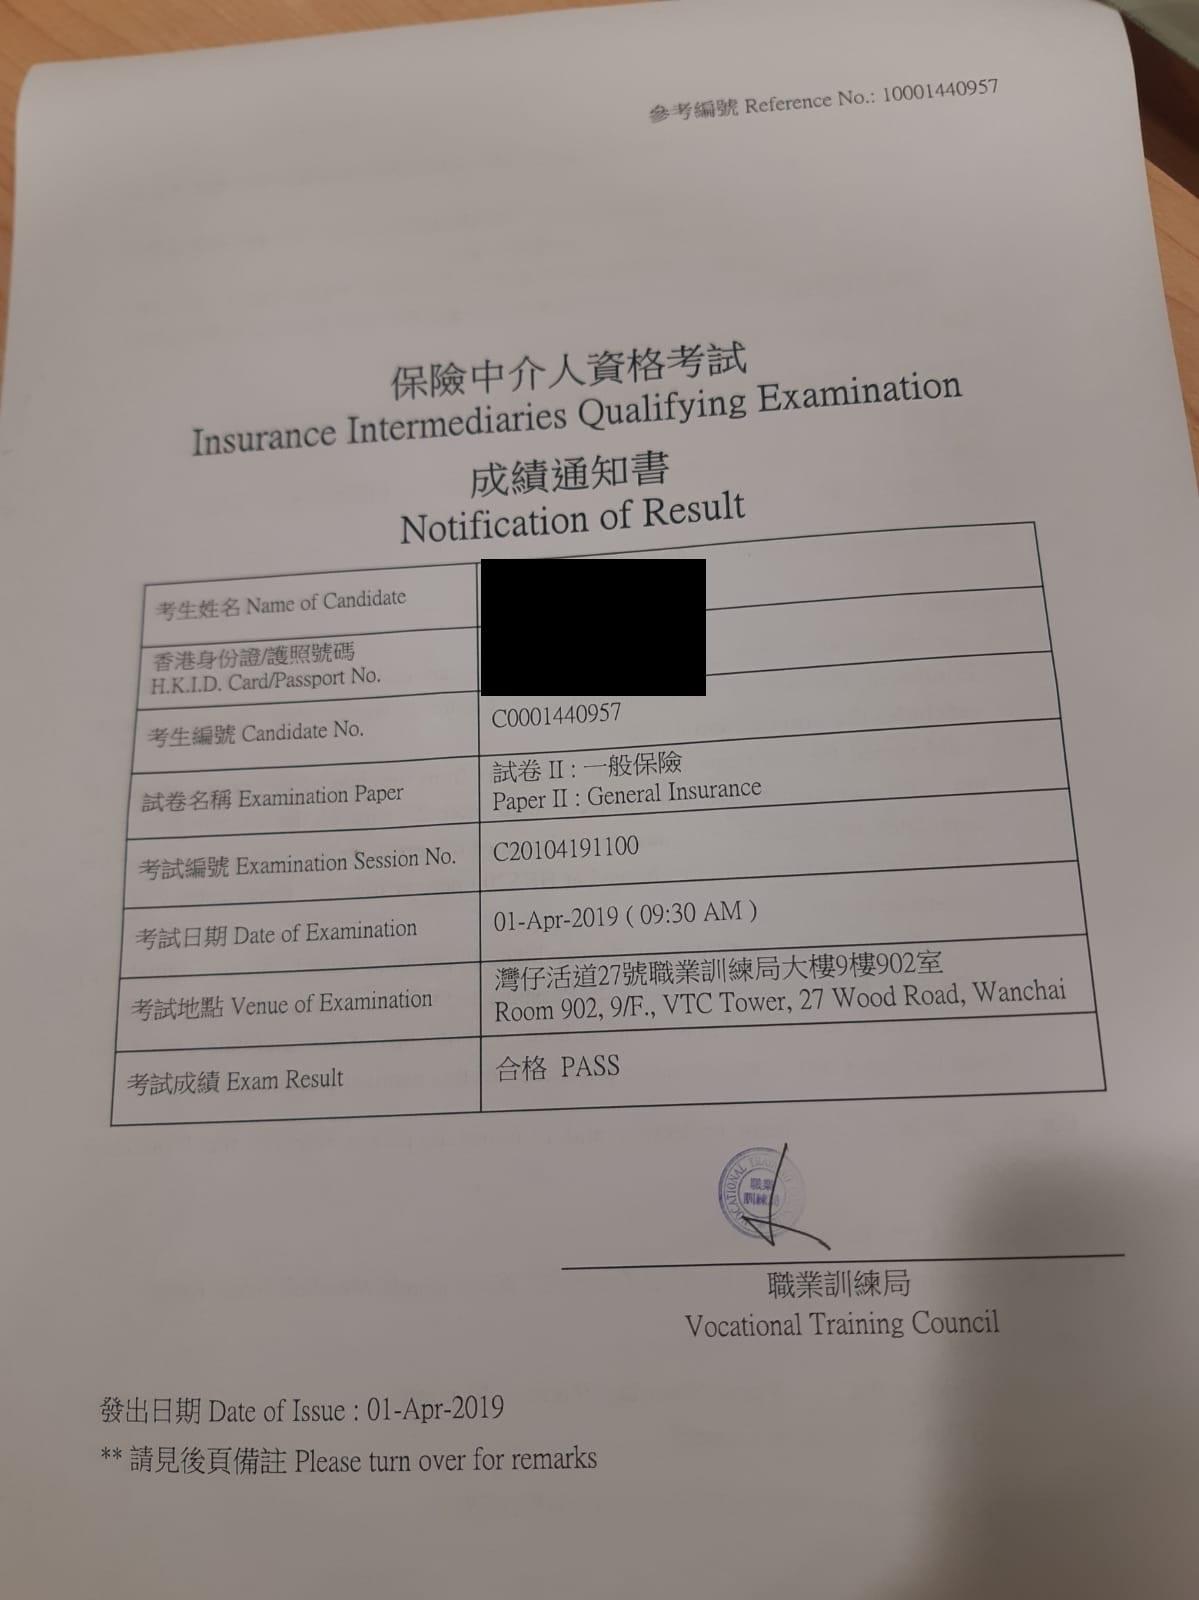 TMH 1/4/2019 IIQE Paper 2 保險中介人資格考試卷二 Pass